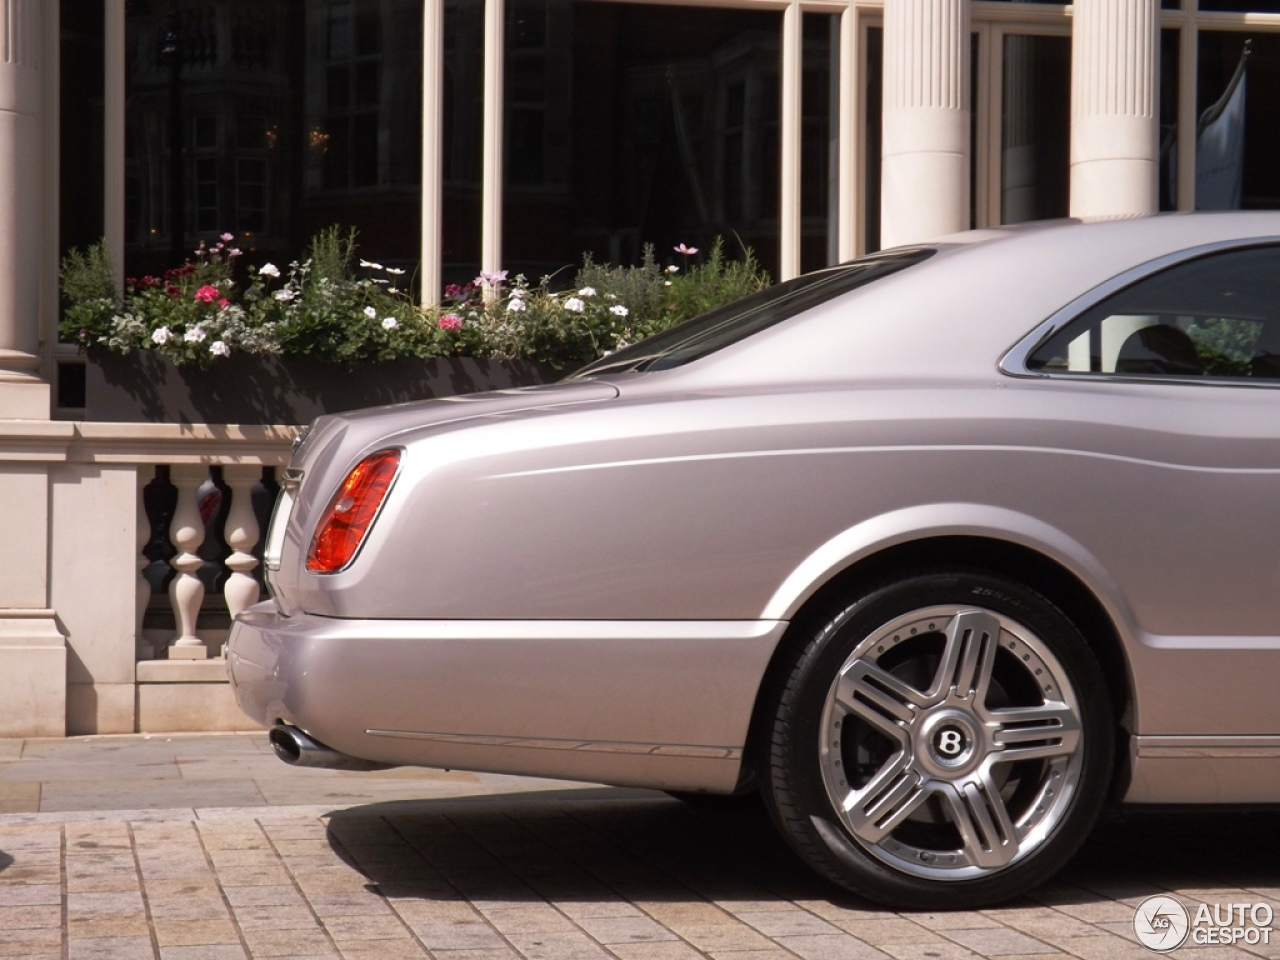 Bentley brooklands 2008 10 january 2014 autogespot 8 i bentley brooklands 2008 8 vanachro Choice Image